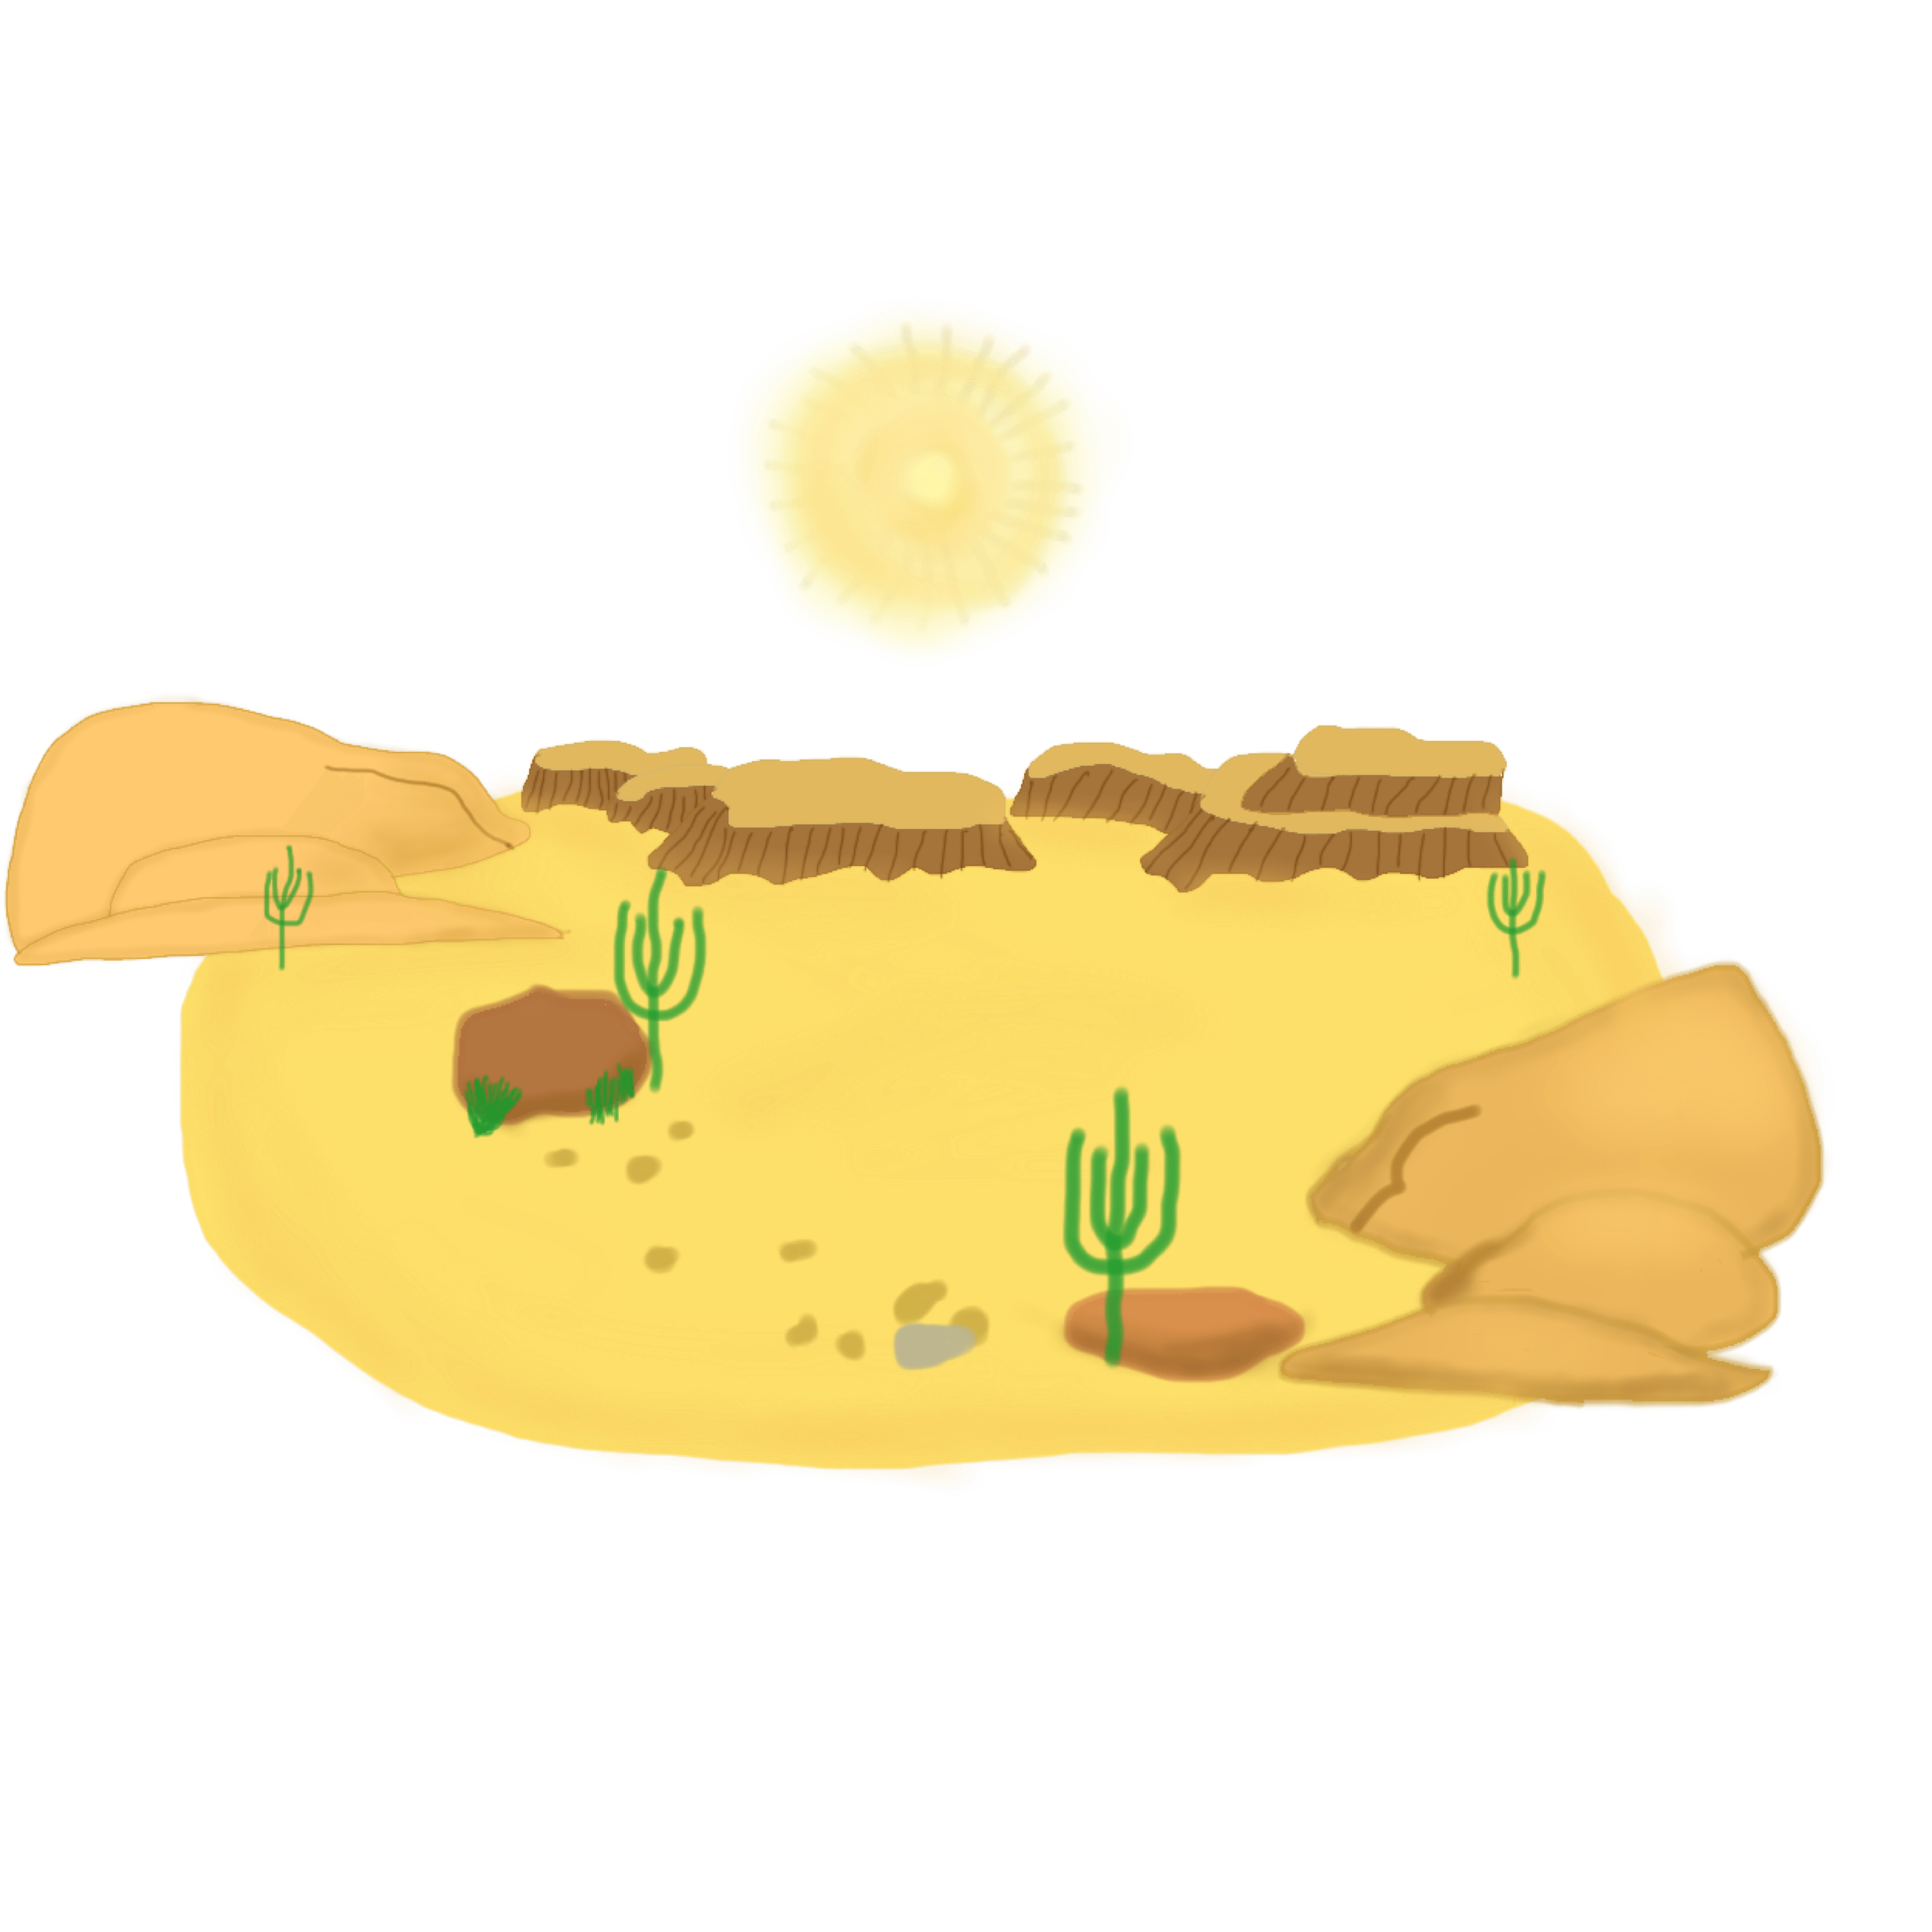 Lake clipart ecosystem. Group desert hanslodge cliparts